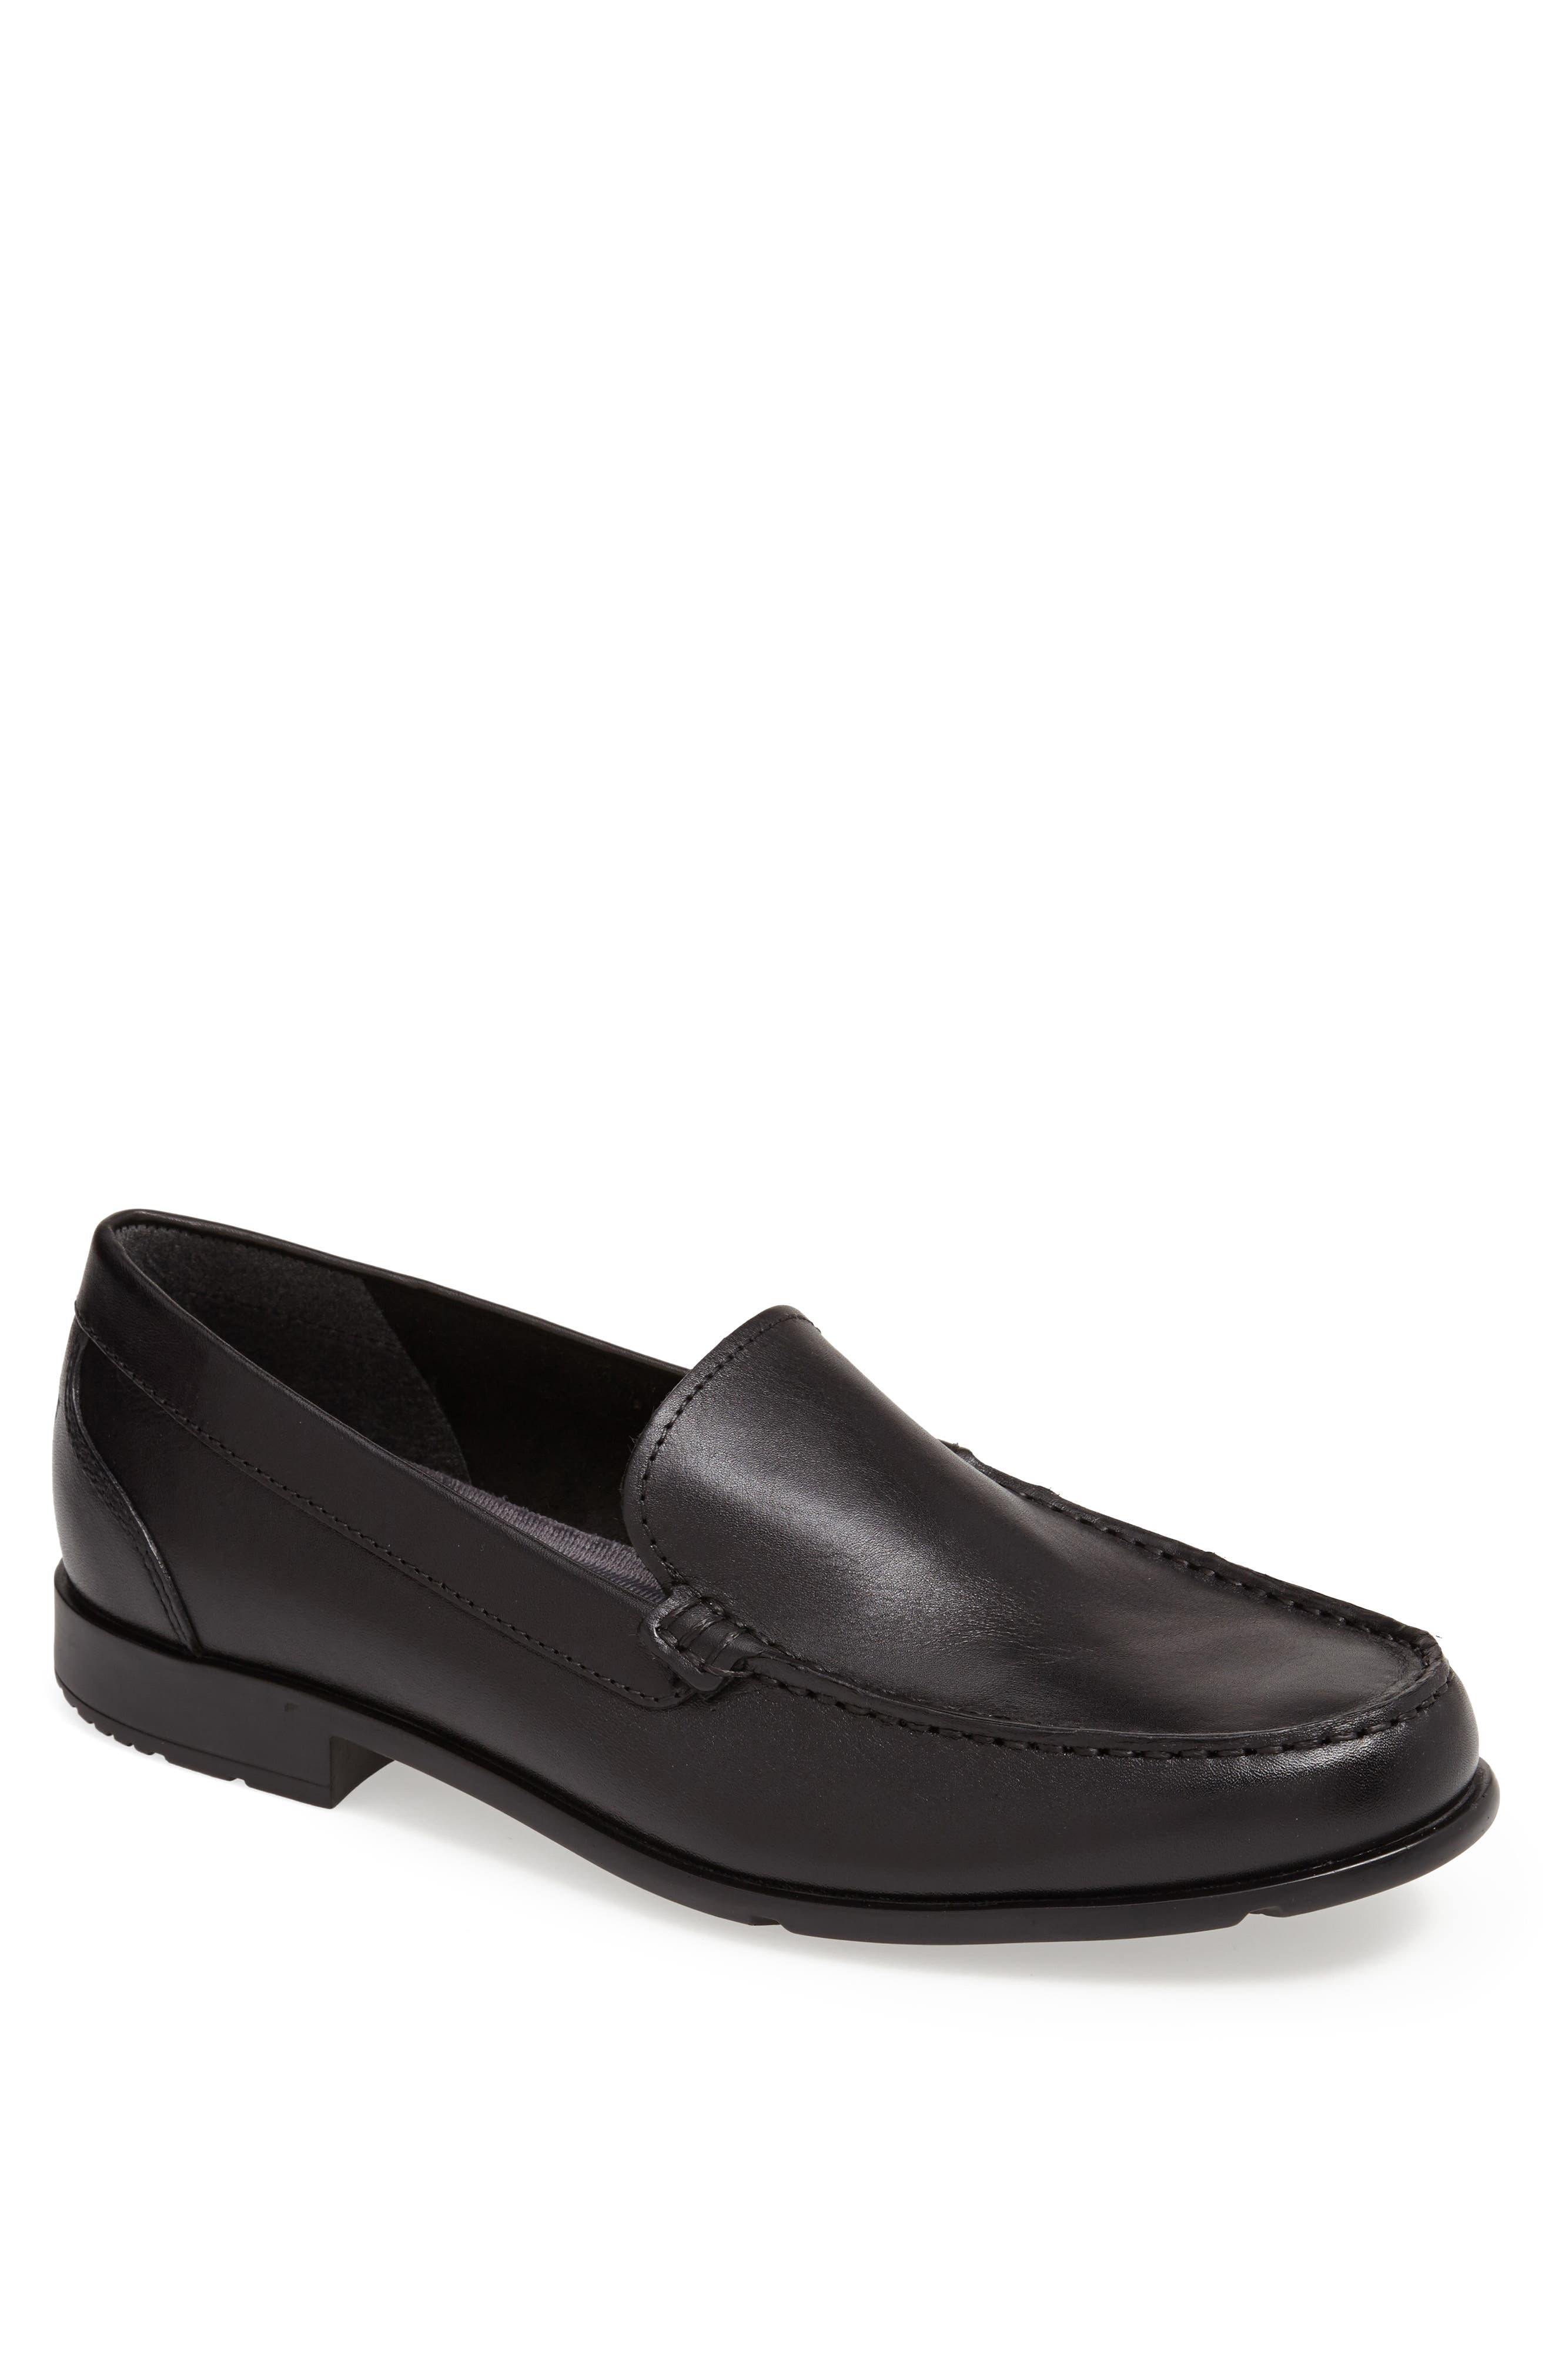 42b8eb188 Men's Loafers Under $100 | Nordstrom